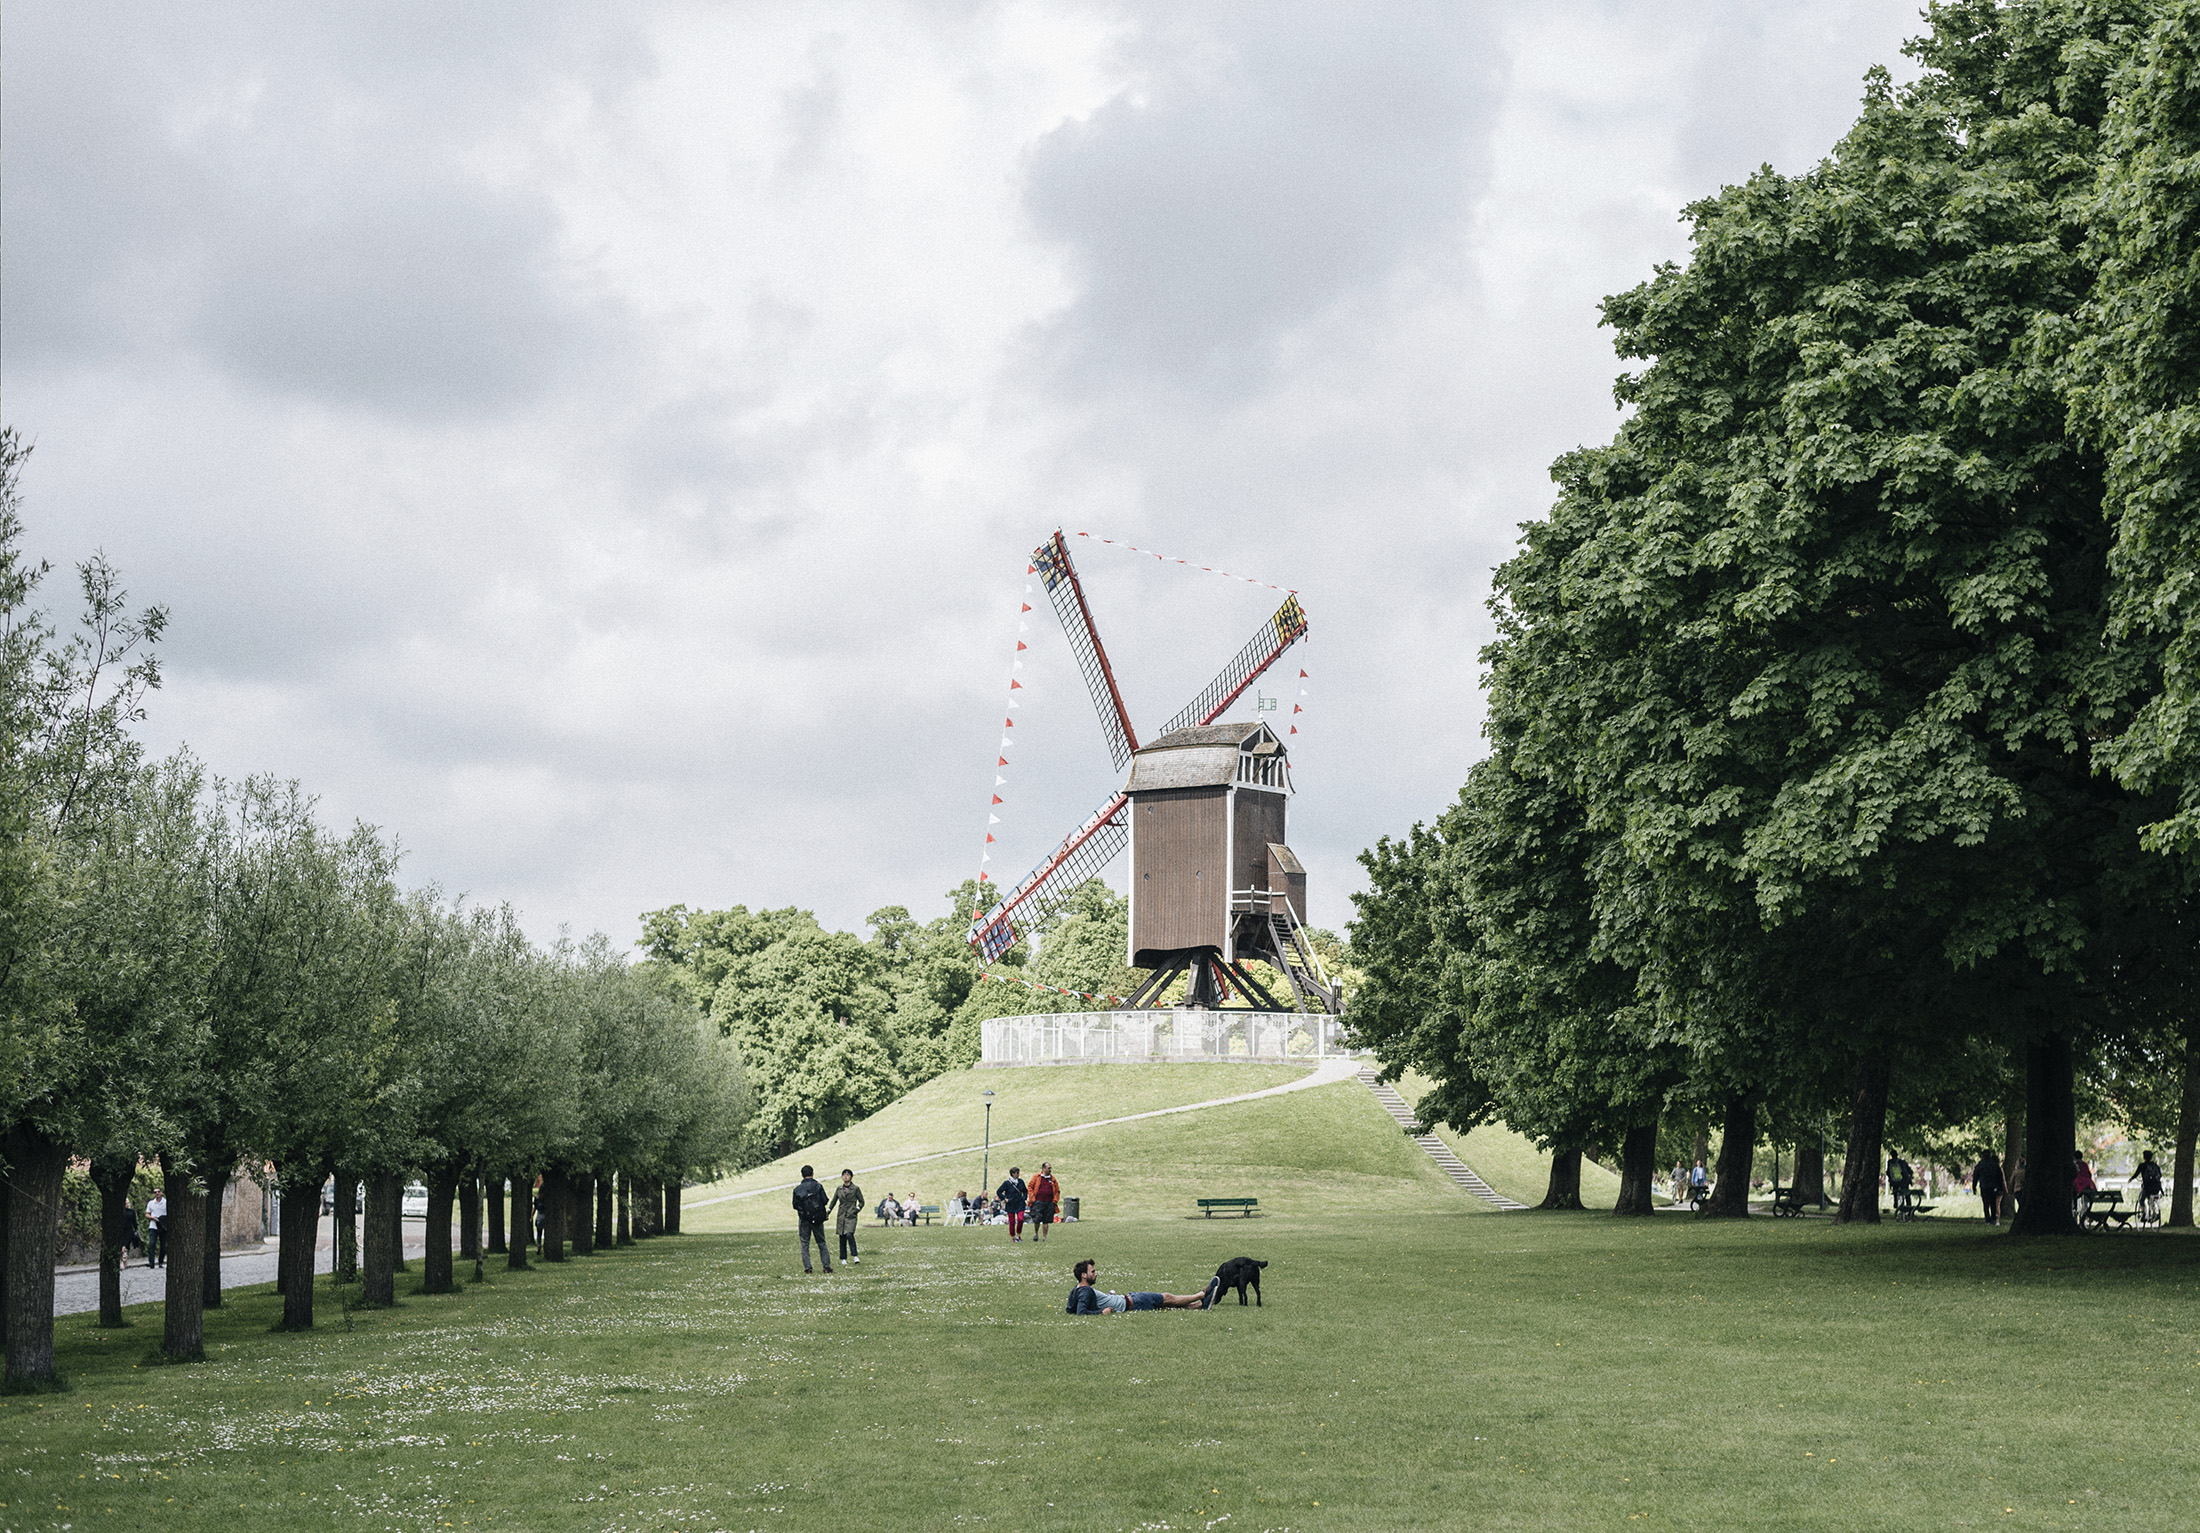 Bruges Belgium spring windmill park - Patricia Martins yellowish blog